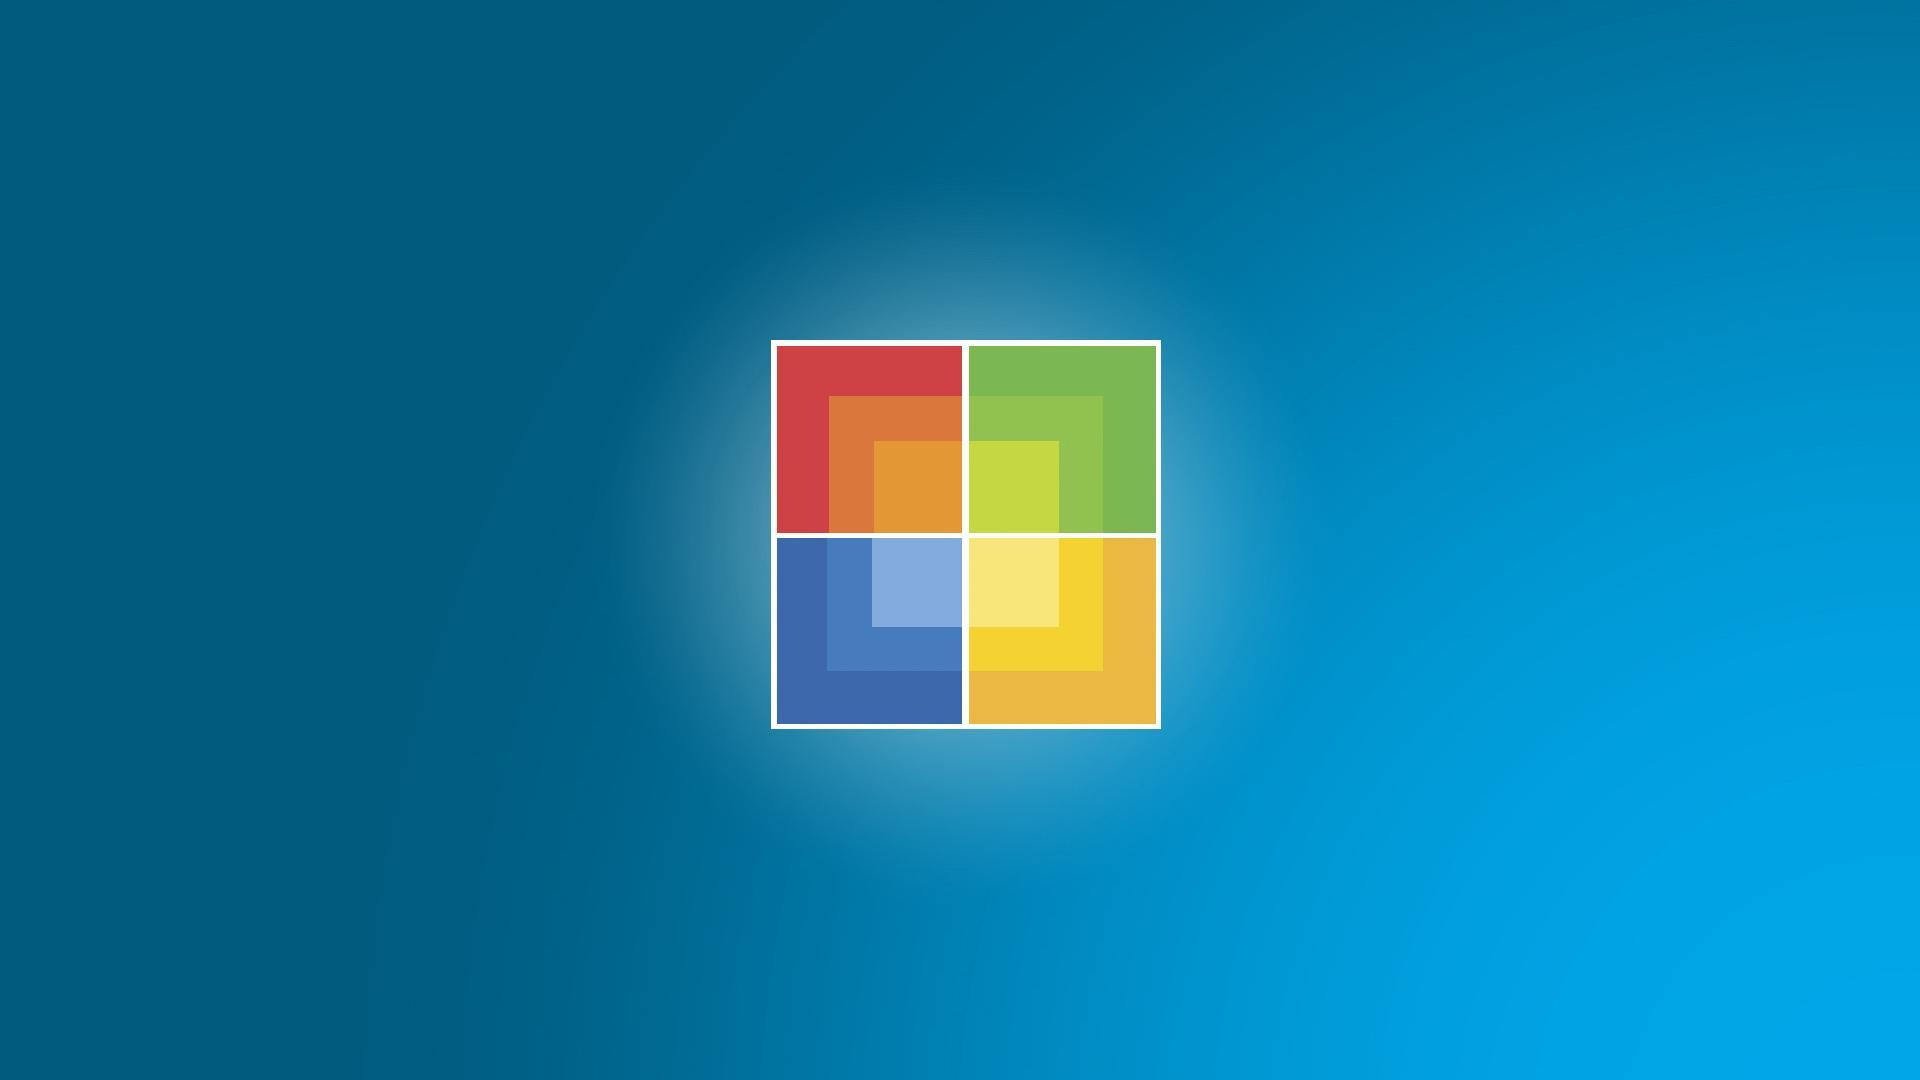 Hd wallpaper colour - Blue Windows Color Hd Wallpapers 4954 Wallpaper Coverhdwallpapers